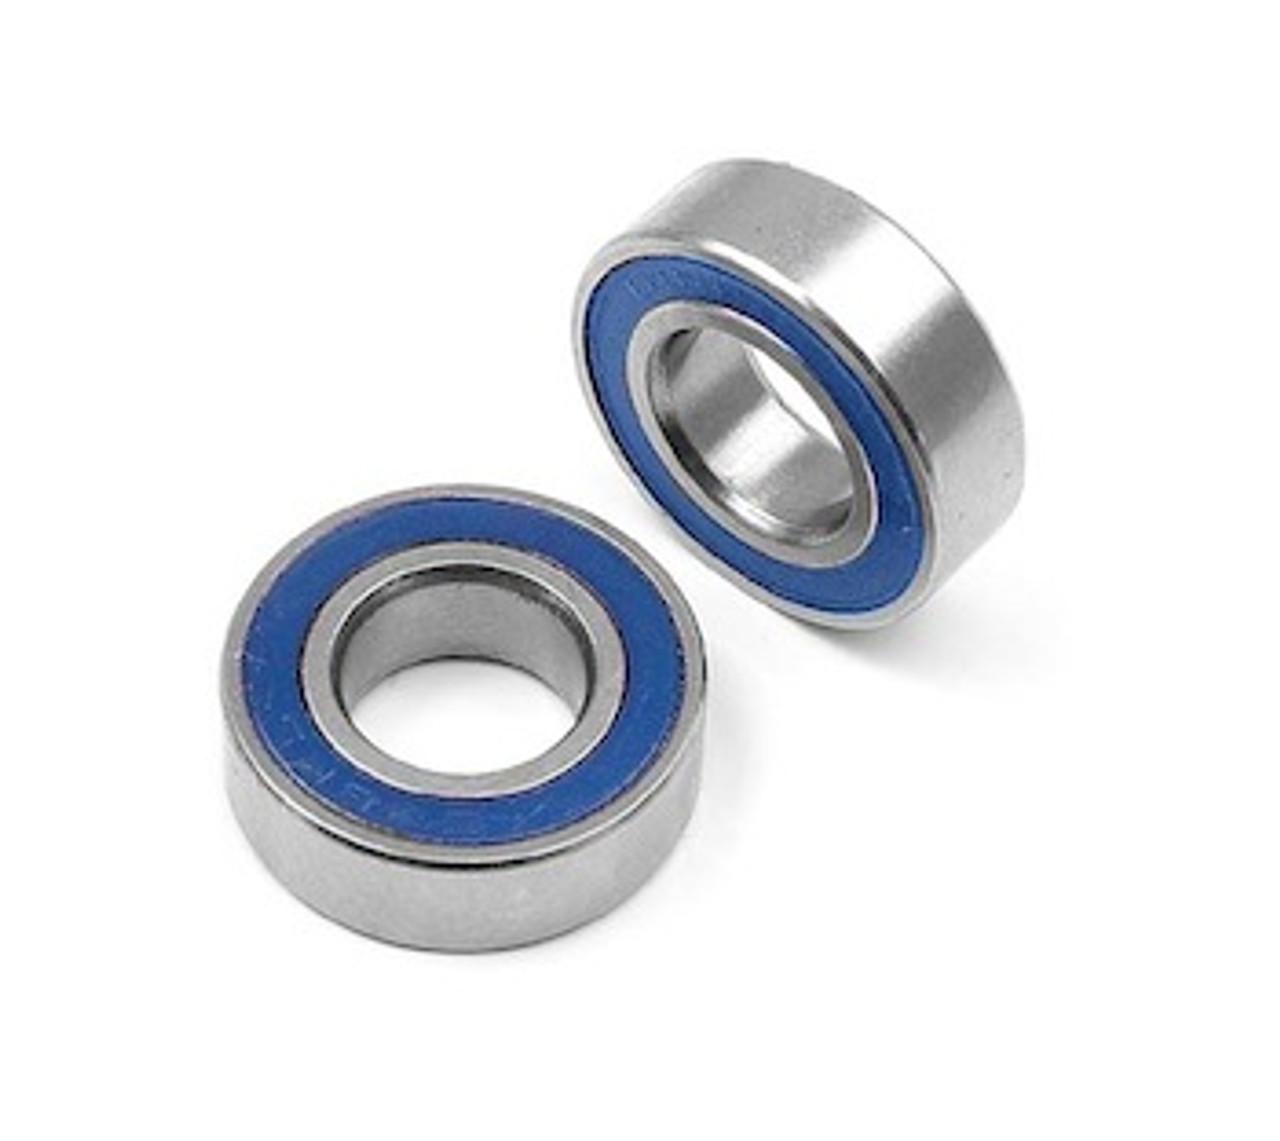 Bearings Metric Series 15x28x7 MM Rubber Sealed (2 Pack) (6902 2RS)